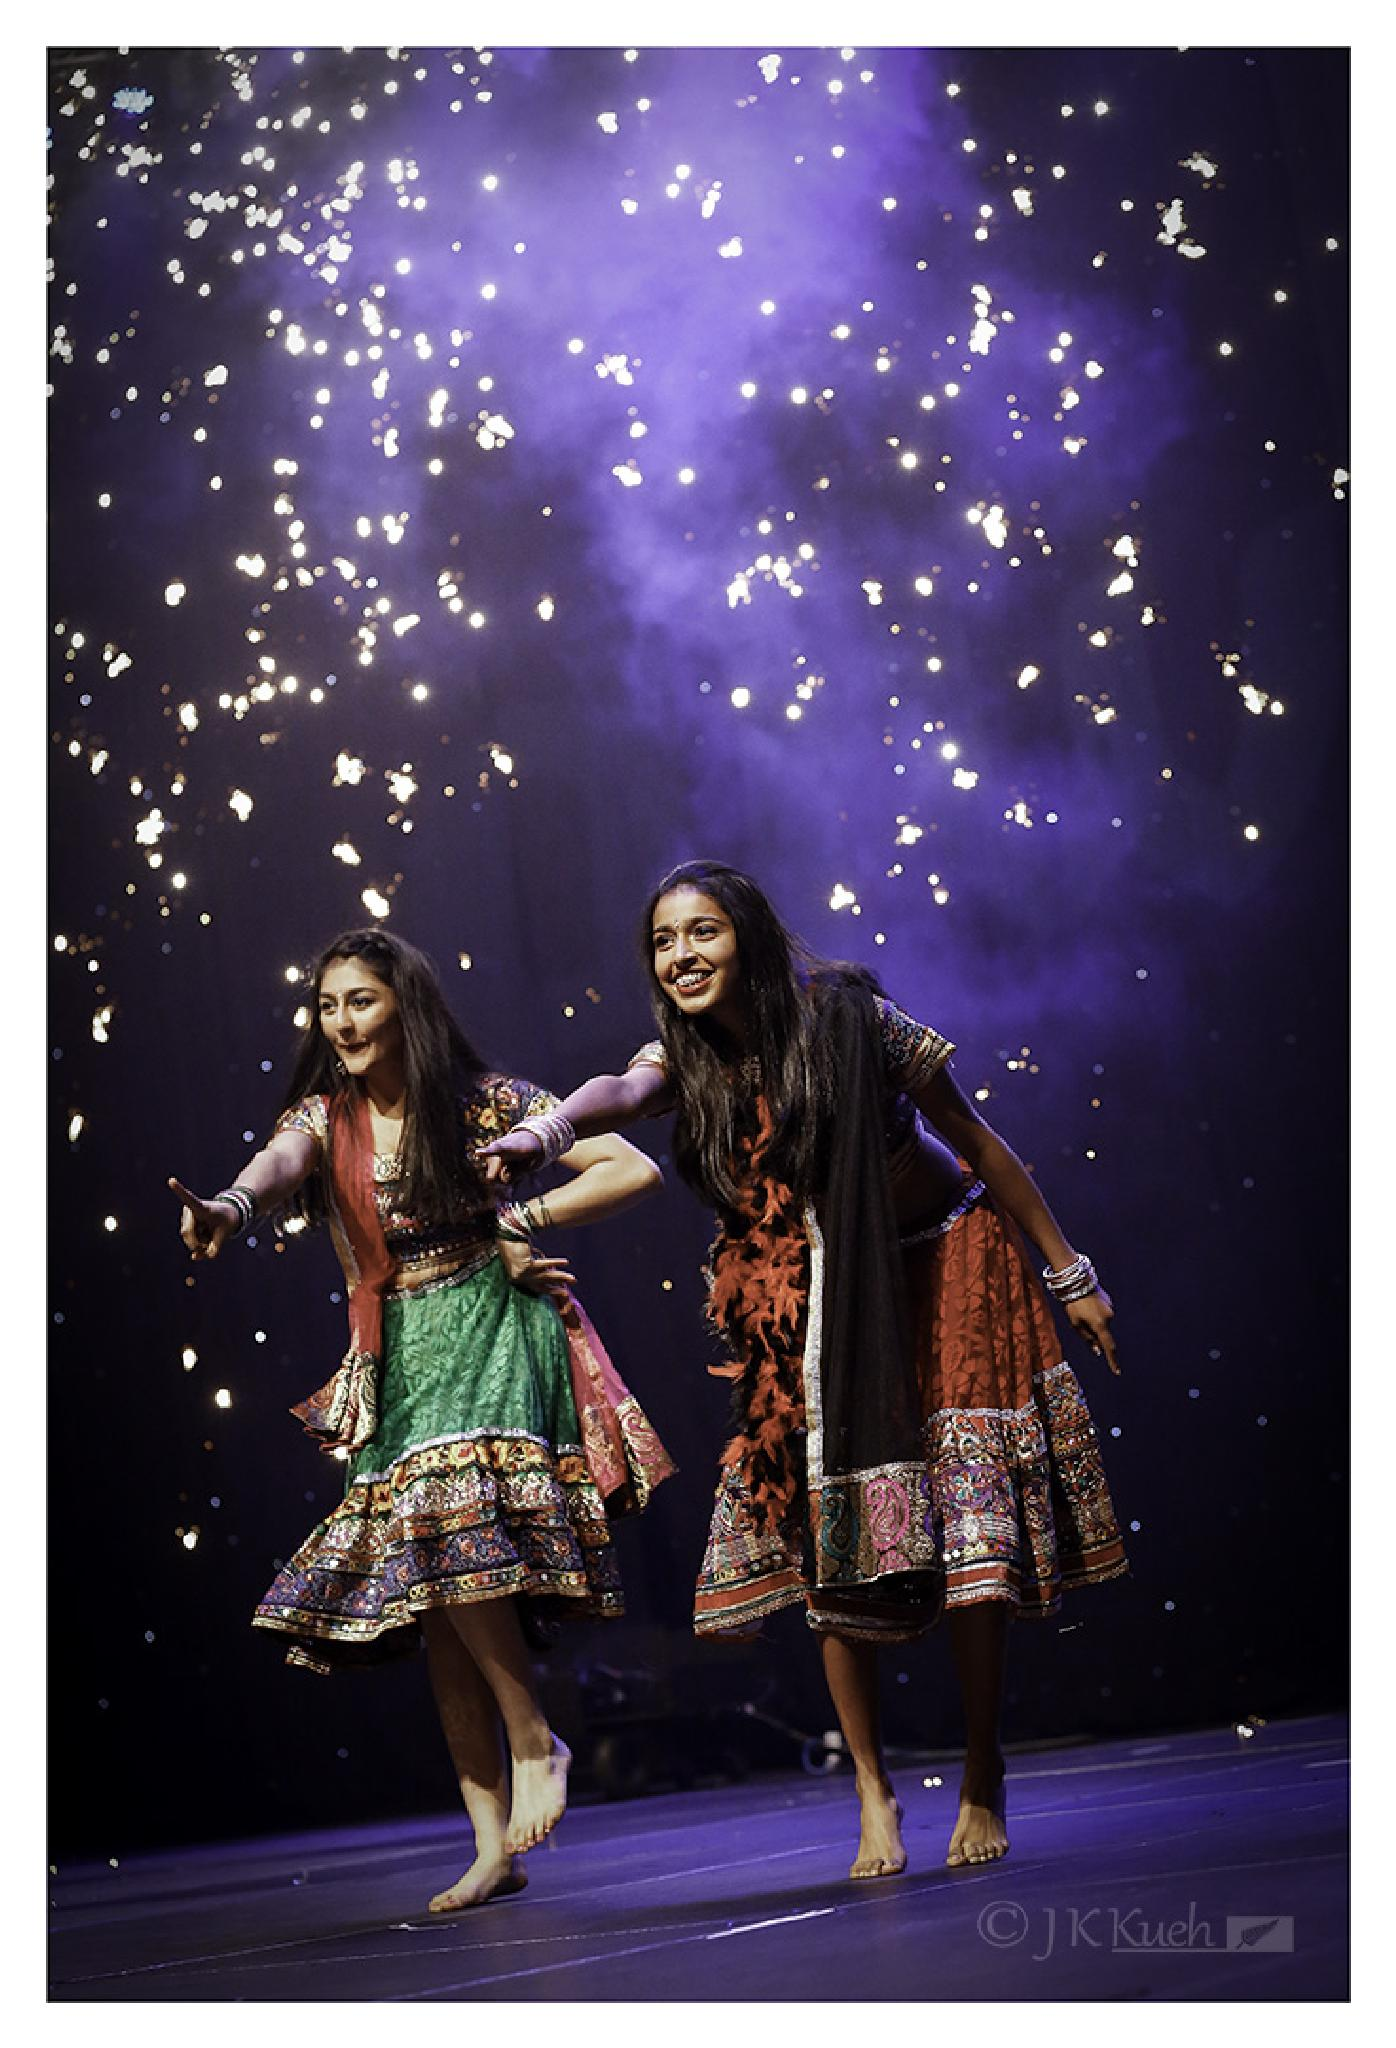 Dancing Divas of Bollywood by jk.kueh